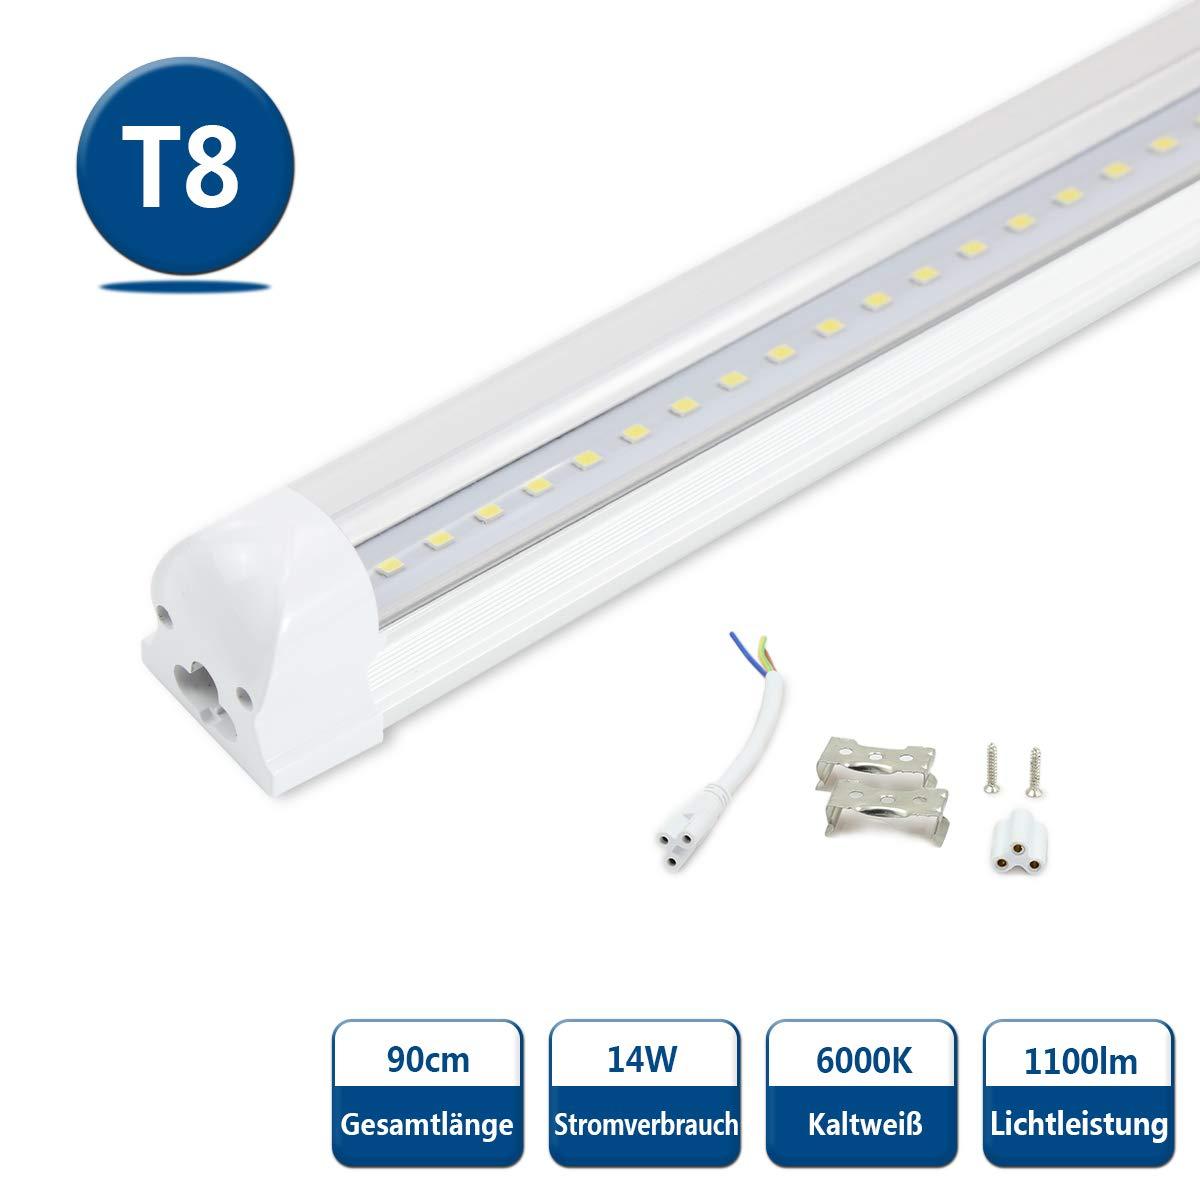 LED Tubo Tubo Tubo T8 Fluorescente 90cm Blanco Frio 6500K 1000lm 14 vatios 230 voltios G13 para Garaje, Taller, Oficina, Centros Comerciales Cubierta Transparente 50f705